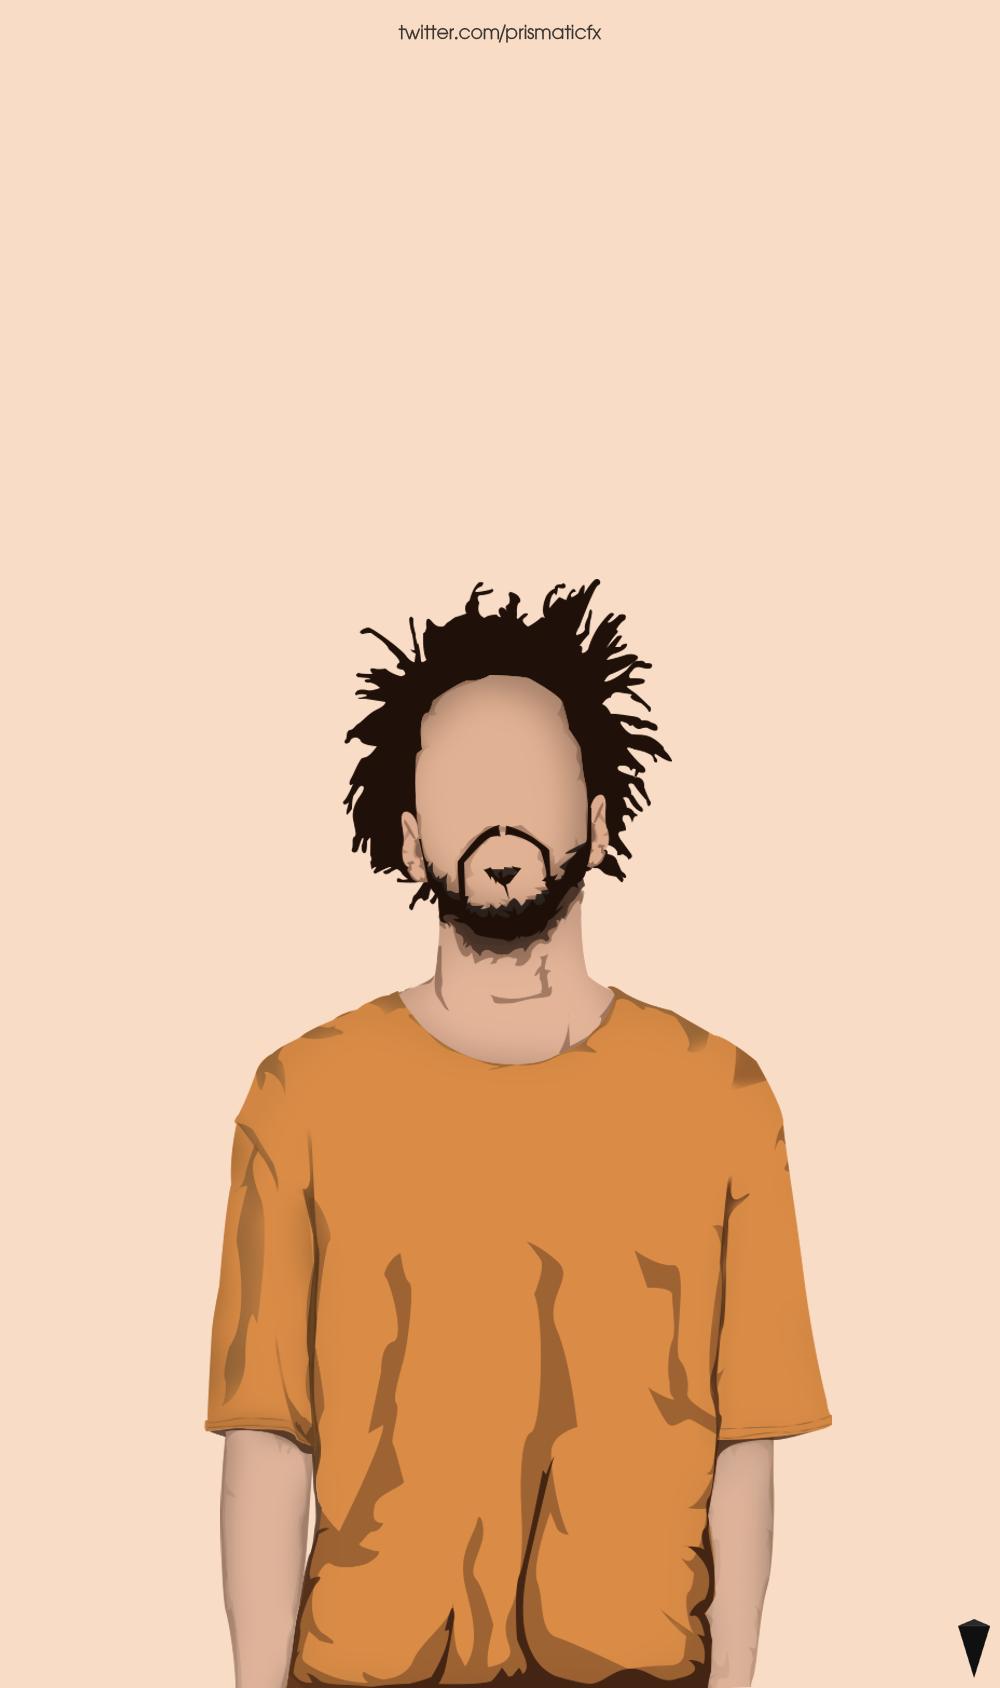 Cole Kendrick Drake Cudi Prismaticfx J Cole Art Rapper Art Rapper Wallpaper Iphone